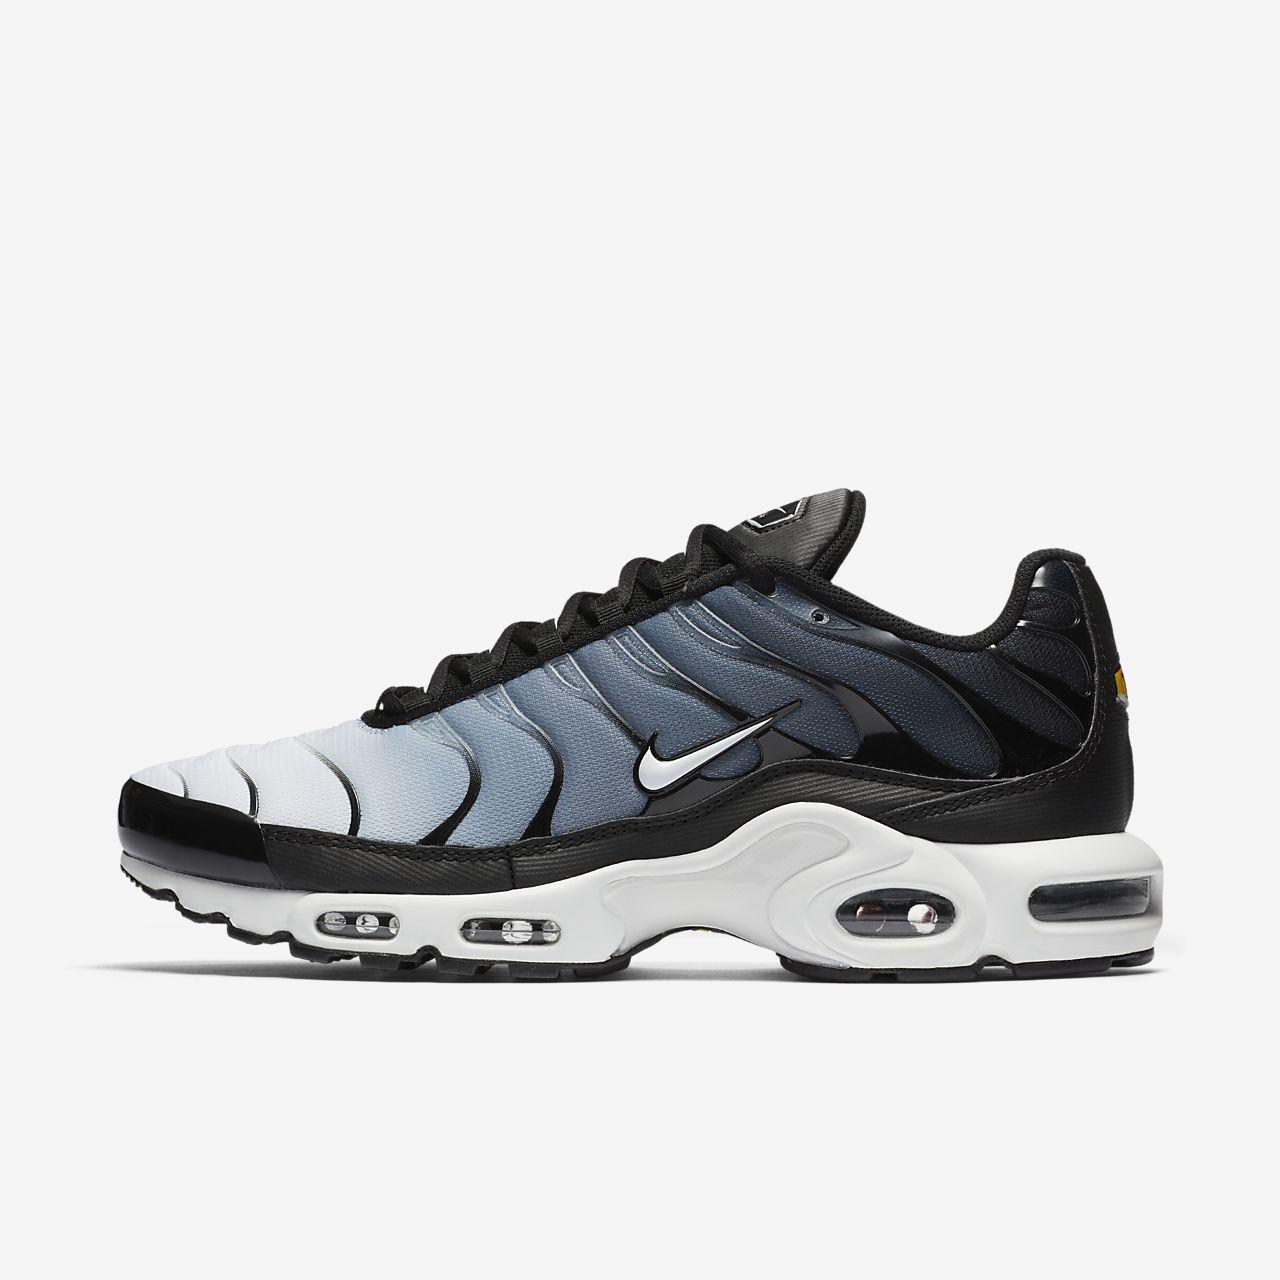 nike uomo scarpe 2018 air max plus